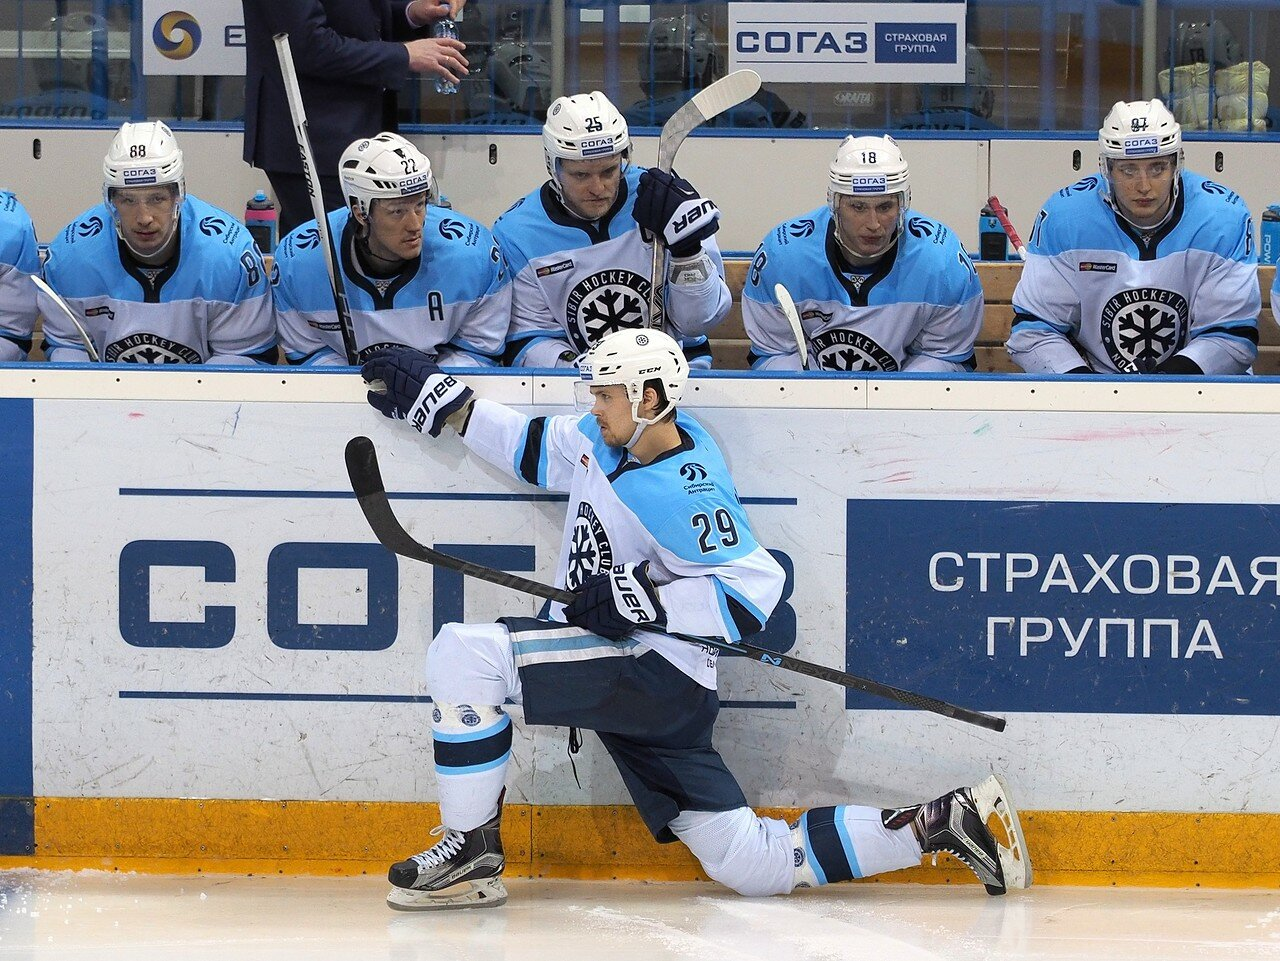 106Плей-офф 2016 Восток 1/2 Металлург - Сибирь 10.03.2016